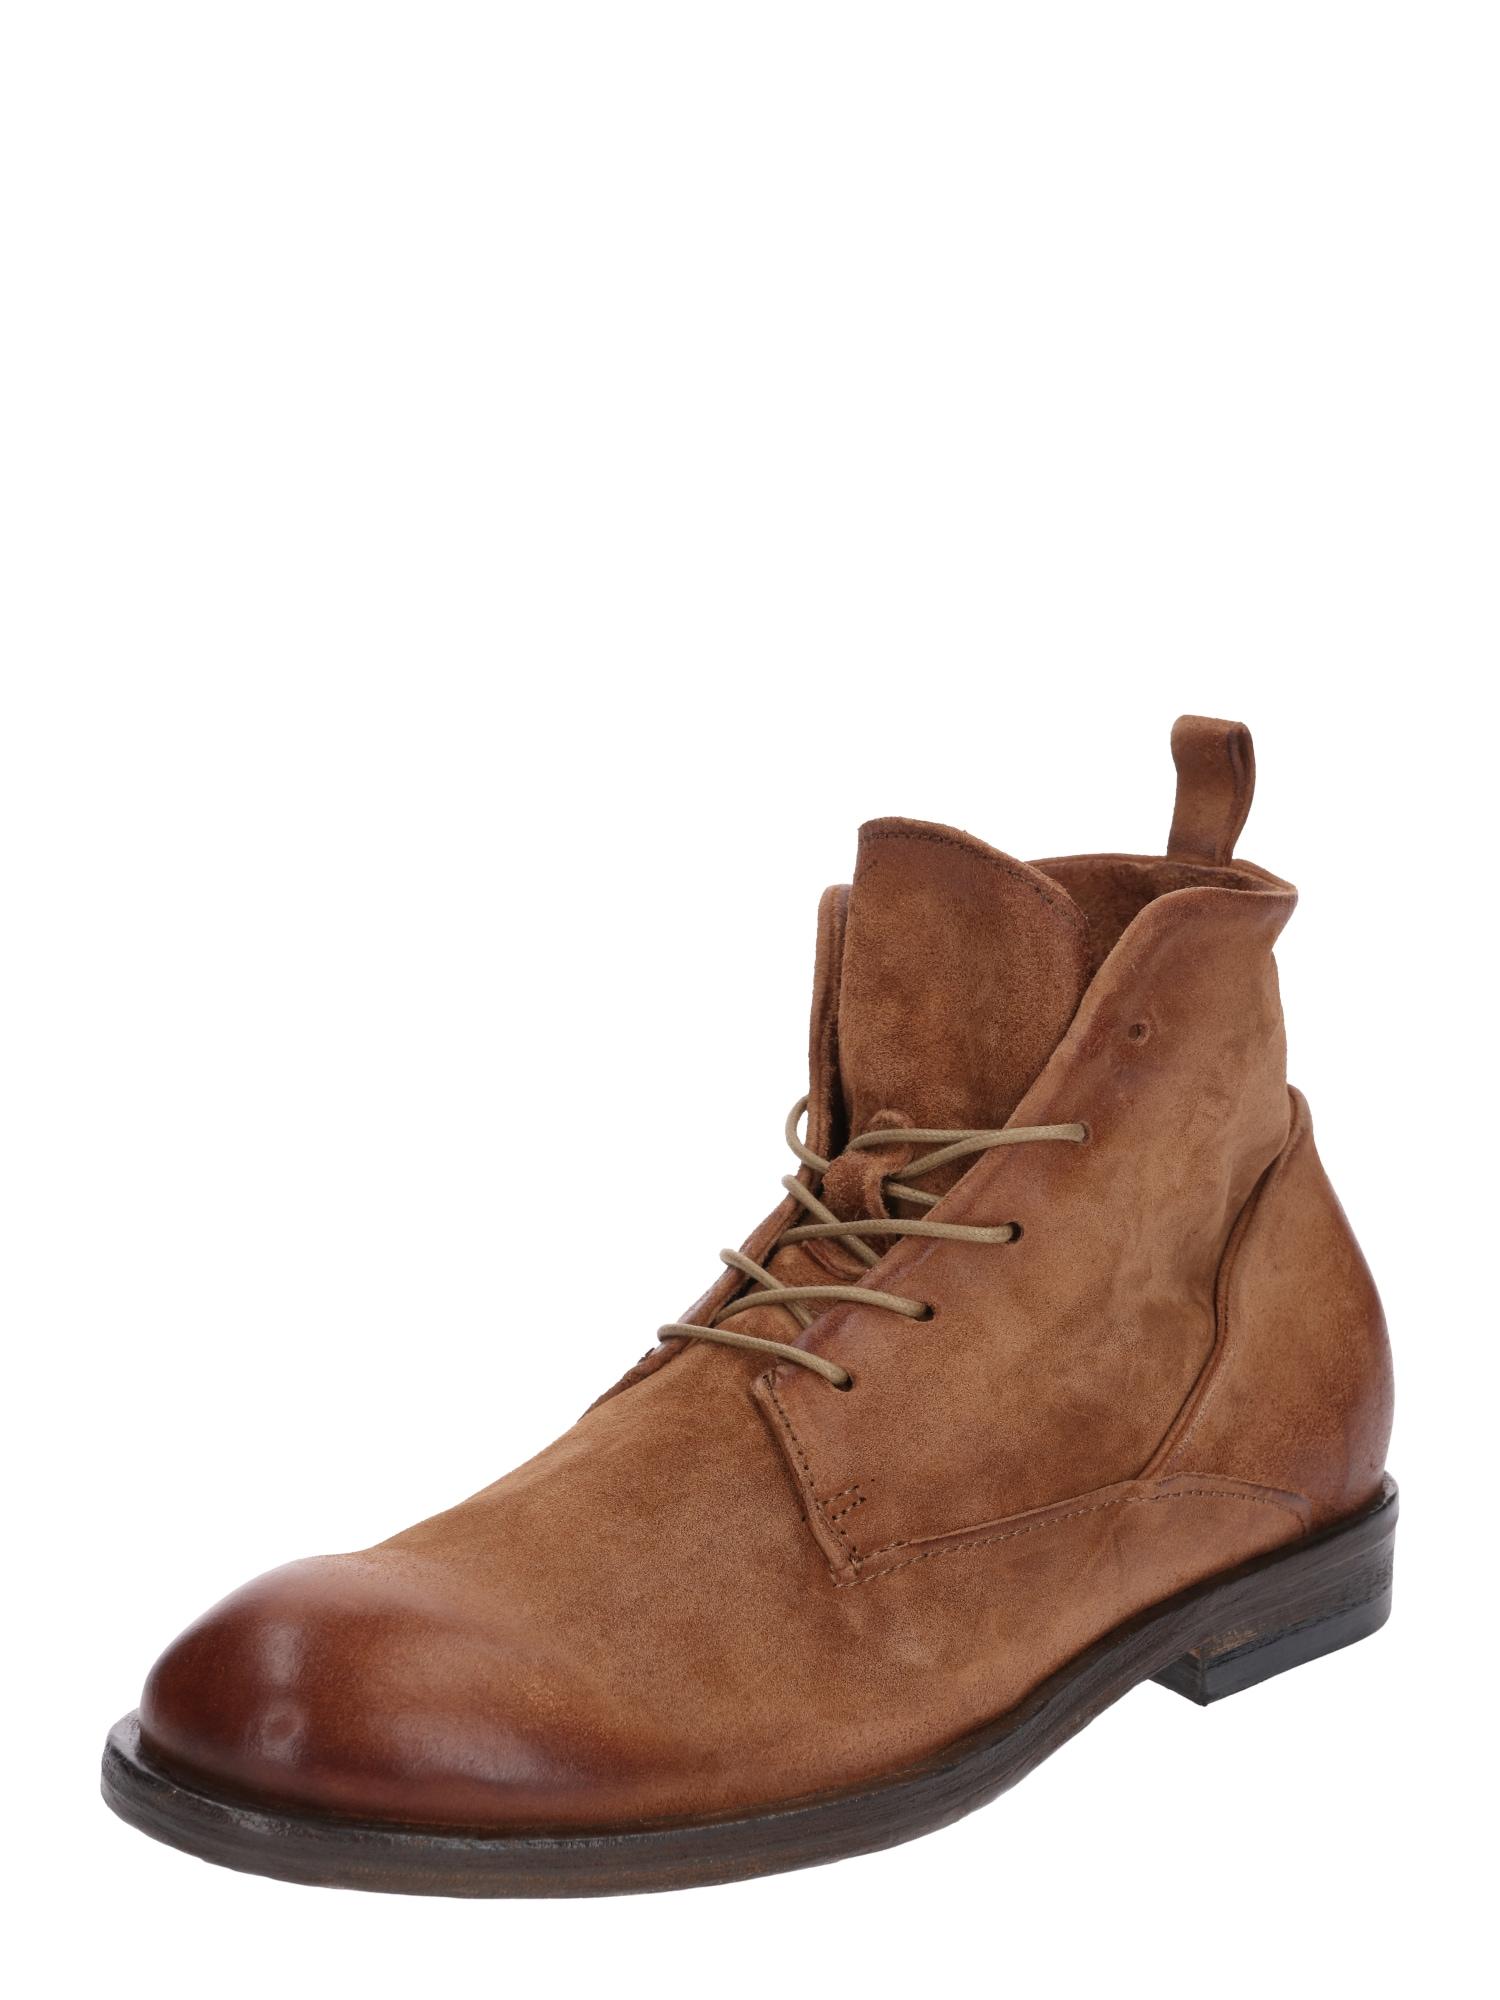 Šněrovací boty Briklane koňaková A.S.98